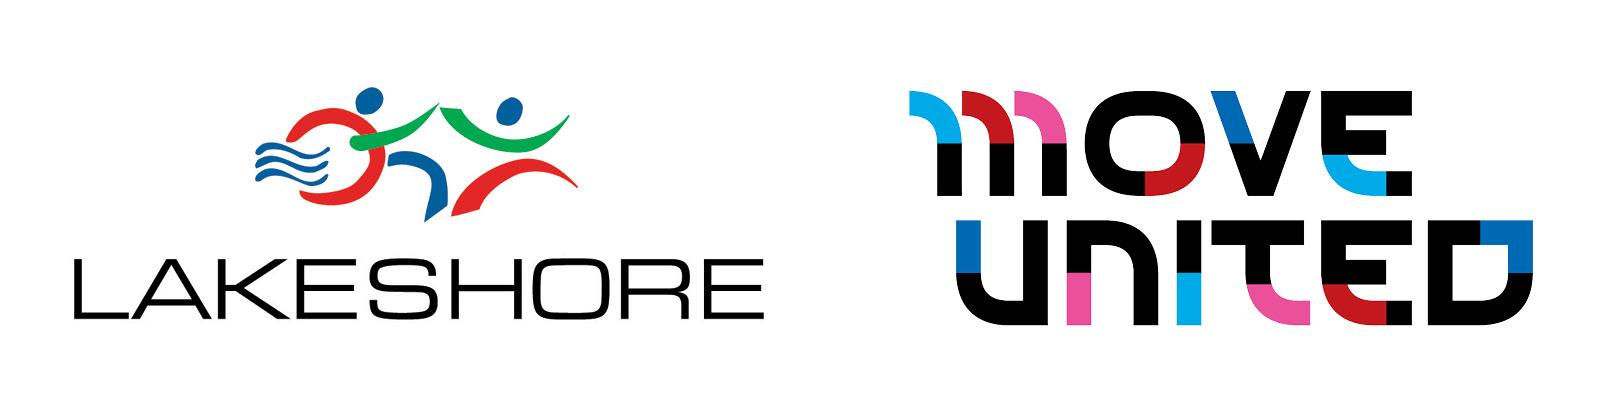 Lakeshore Move United Logo